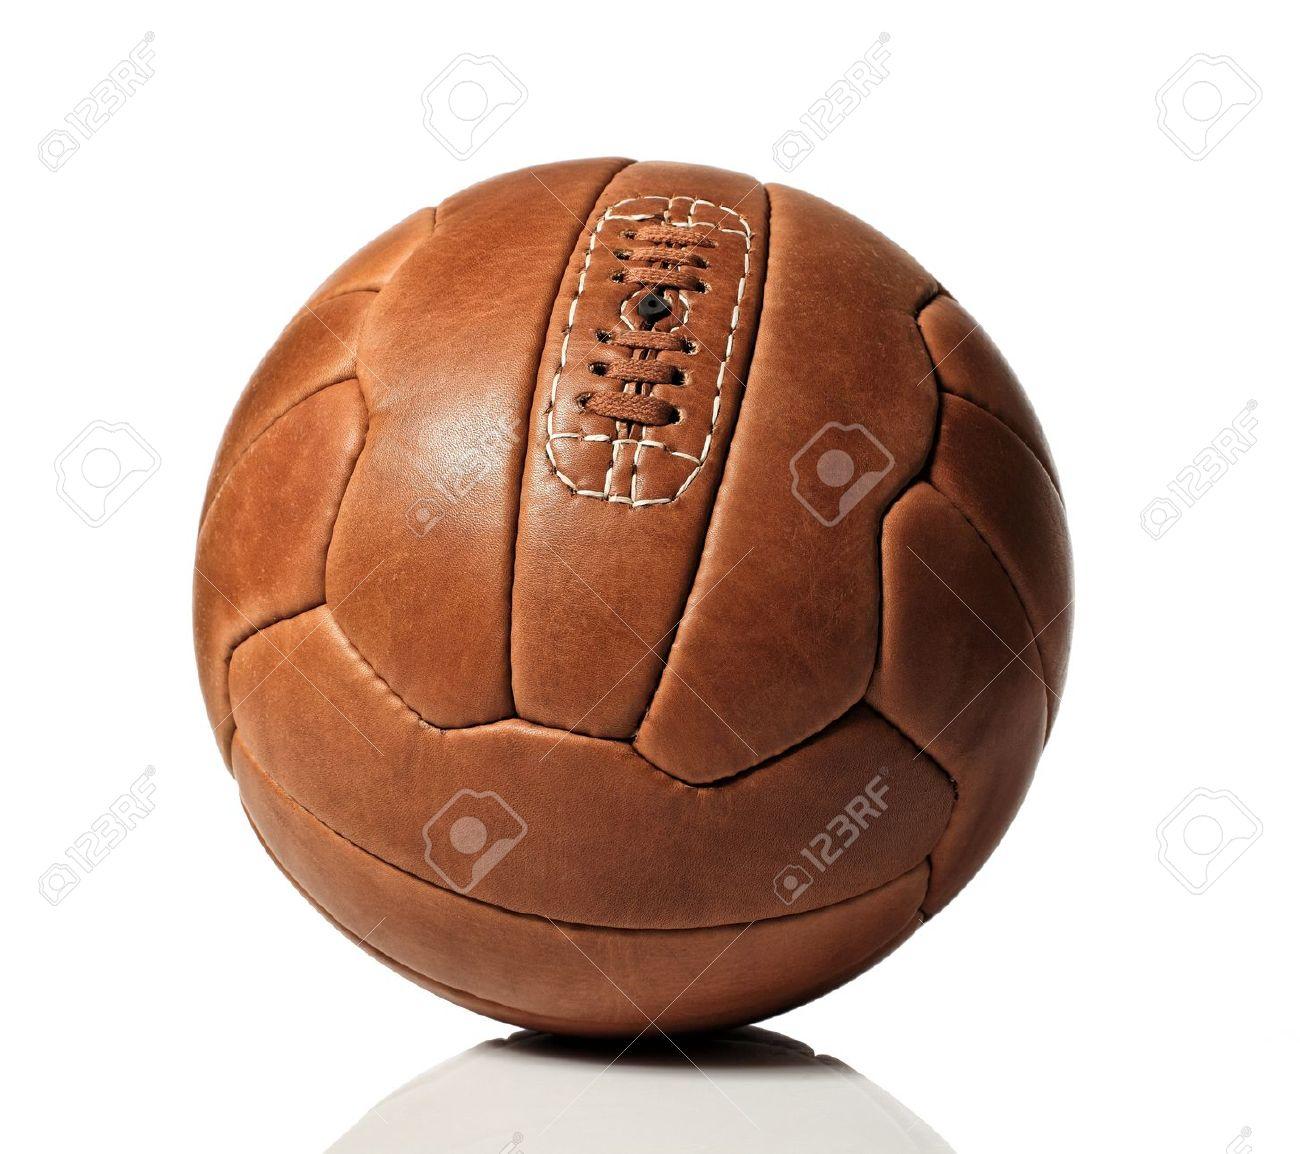 vintage soccer ball on white background Stock Photo - 12703855